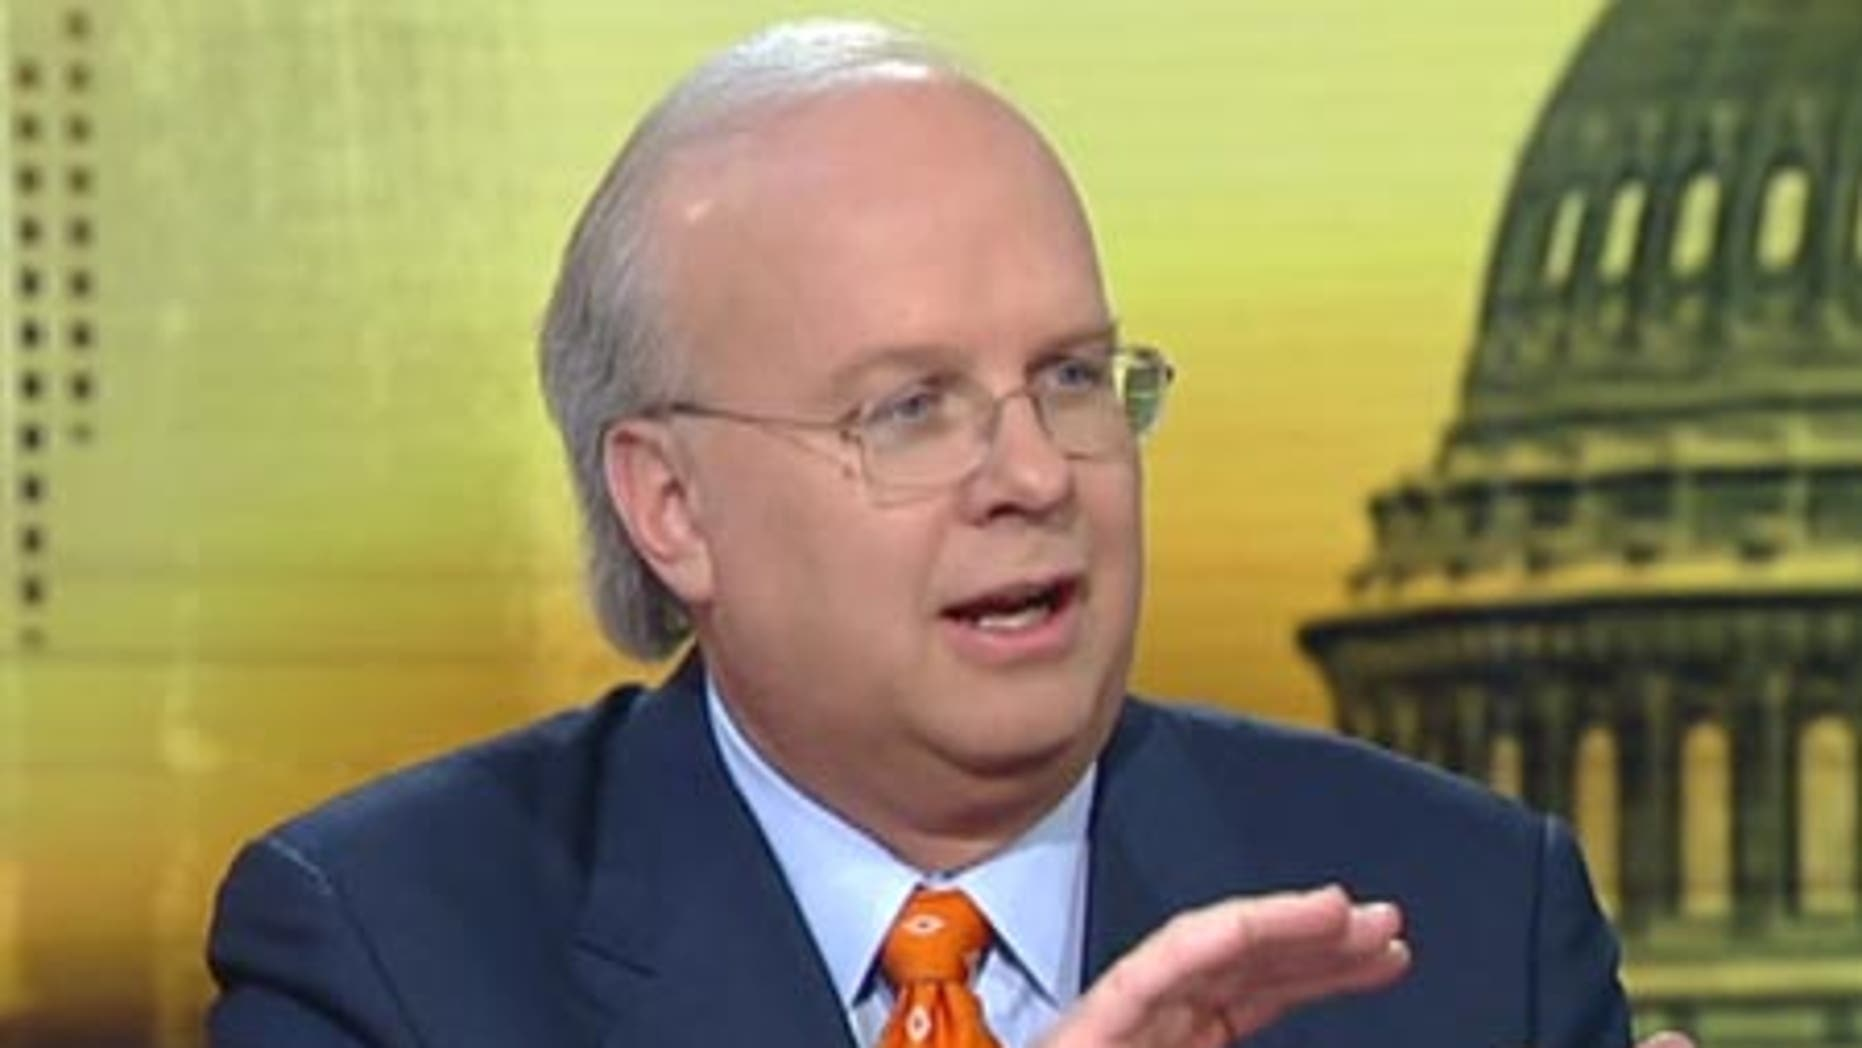 Former Bush adviser and Fox News contributor Karl Rove